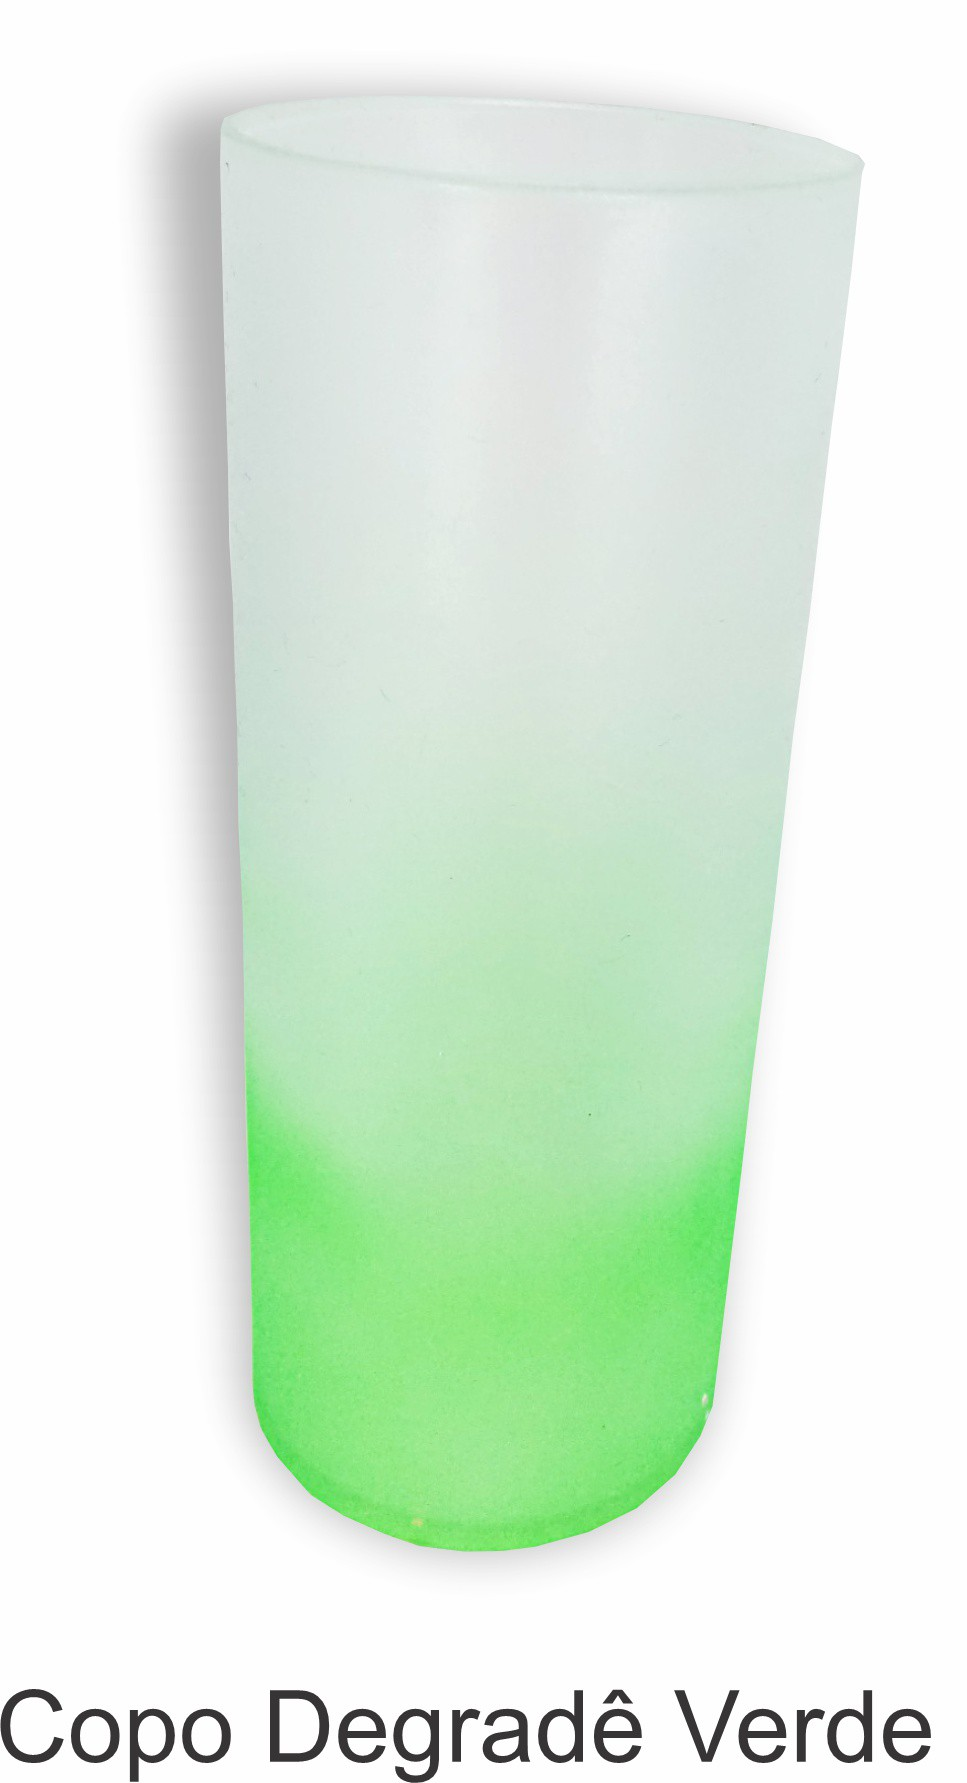 Copo Acrílico Degrade 300 ml. - kit com 06 unidades